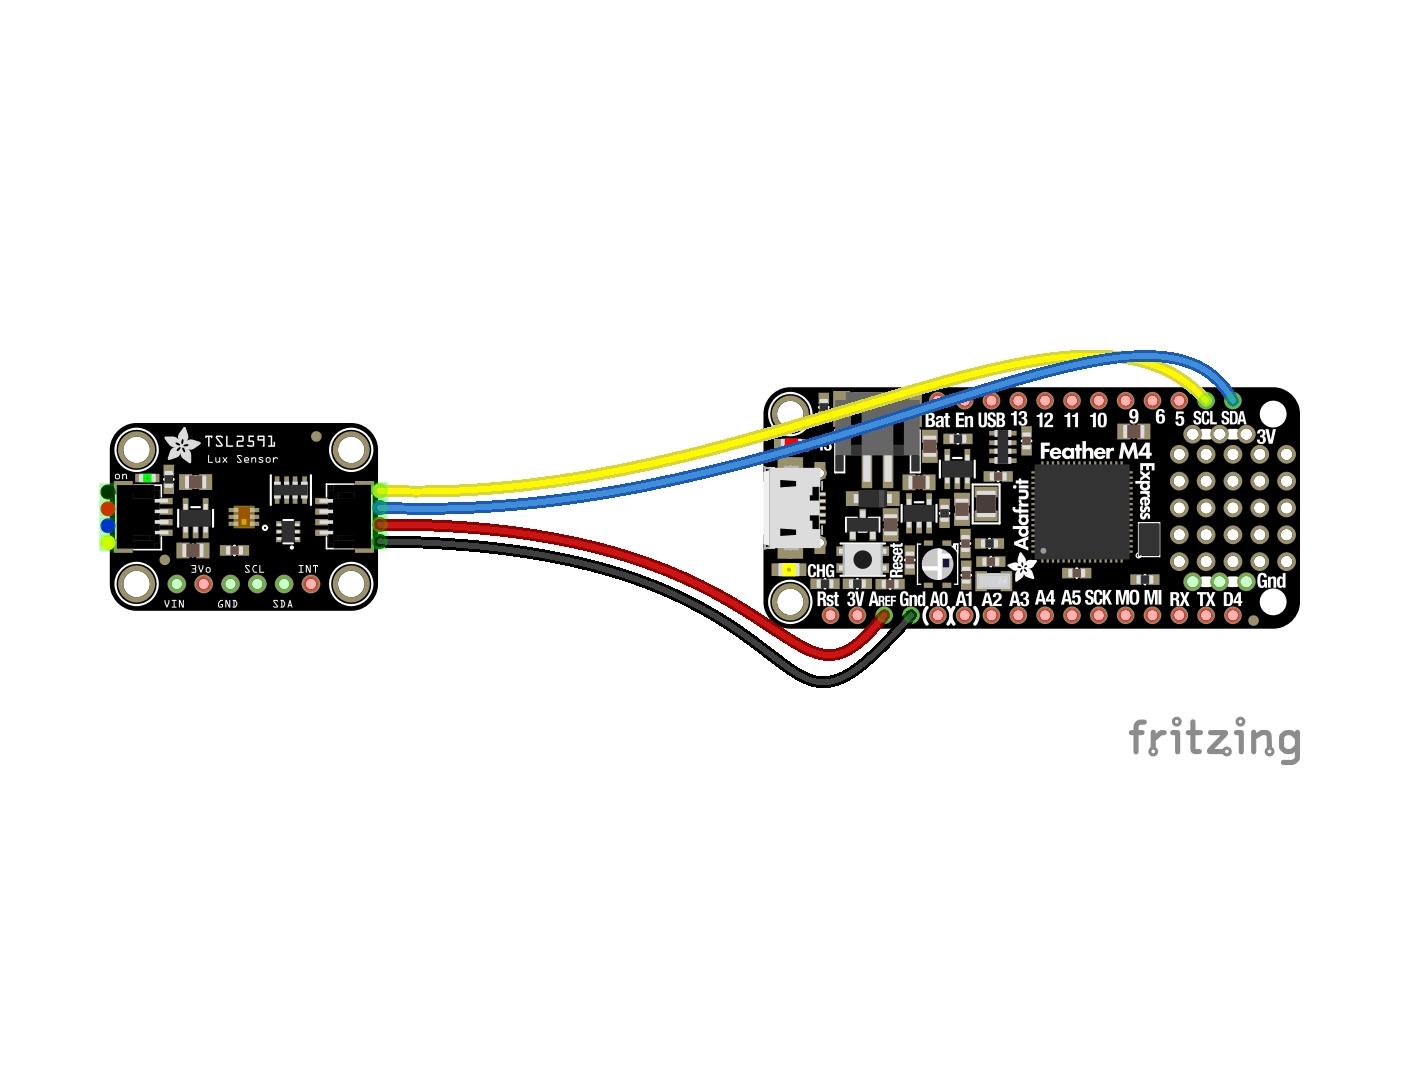 circuitpython_Essentials_I2C_Feather_bb.jpg